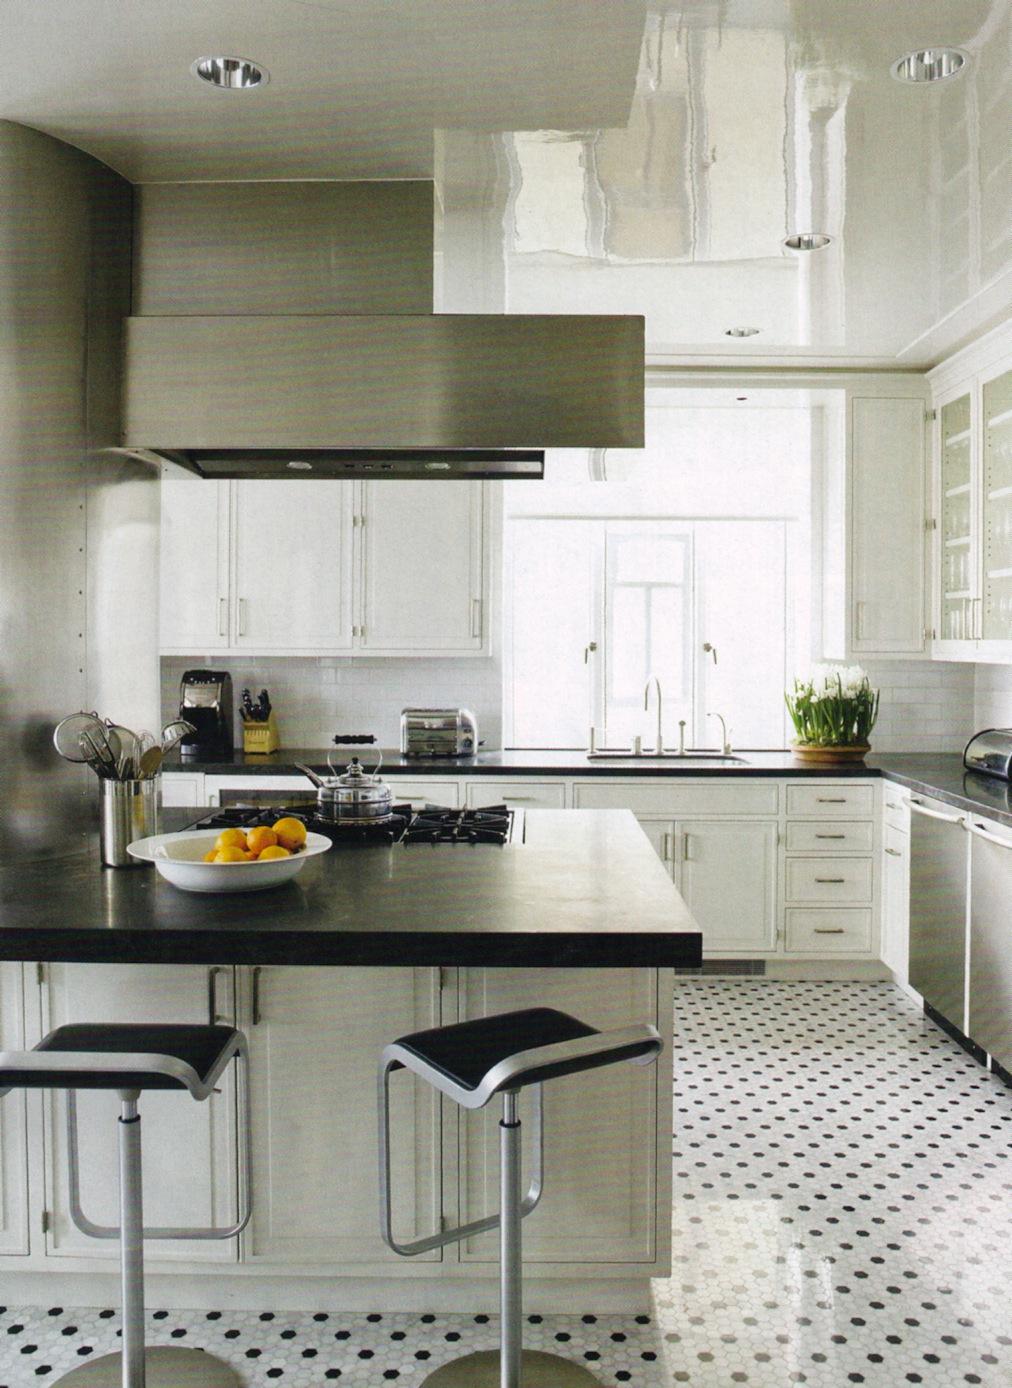 Us Interior Designs Jacques Grange: US Interior Designs: DELPHINE KRAKOFF AND MARK FERGUSON